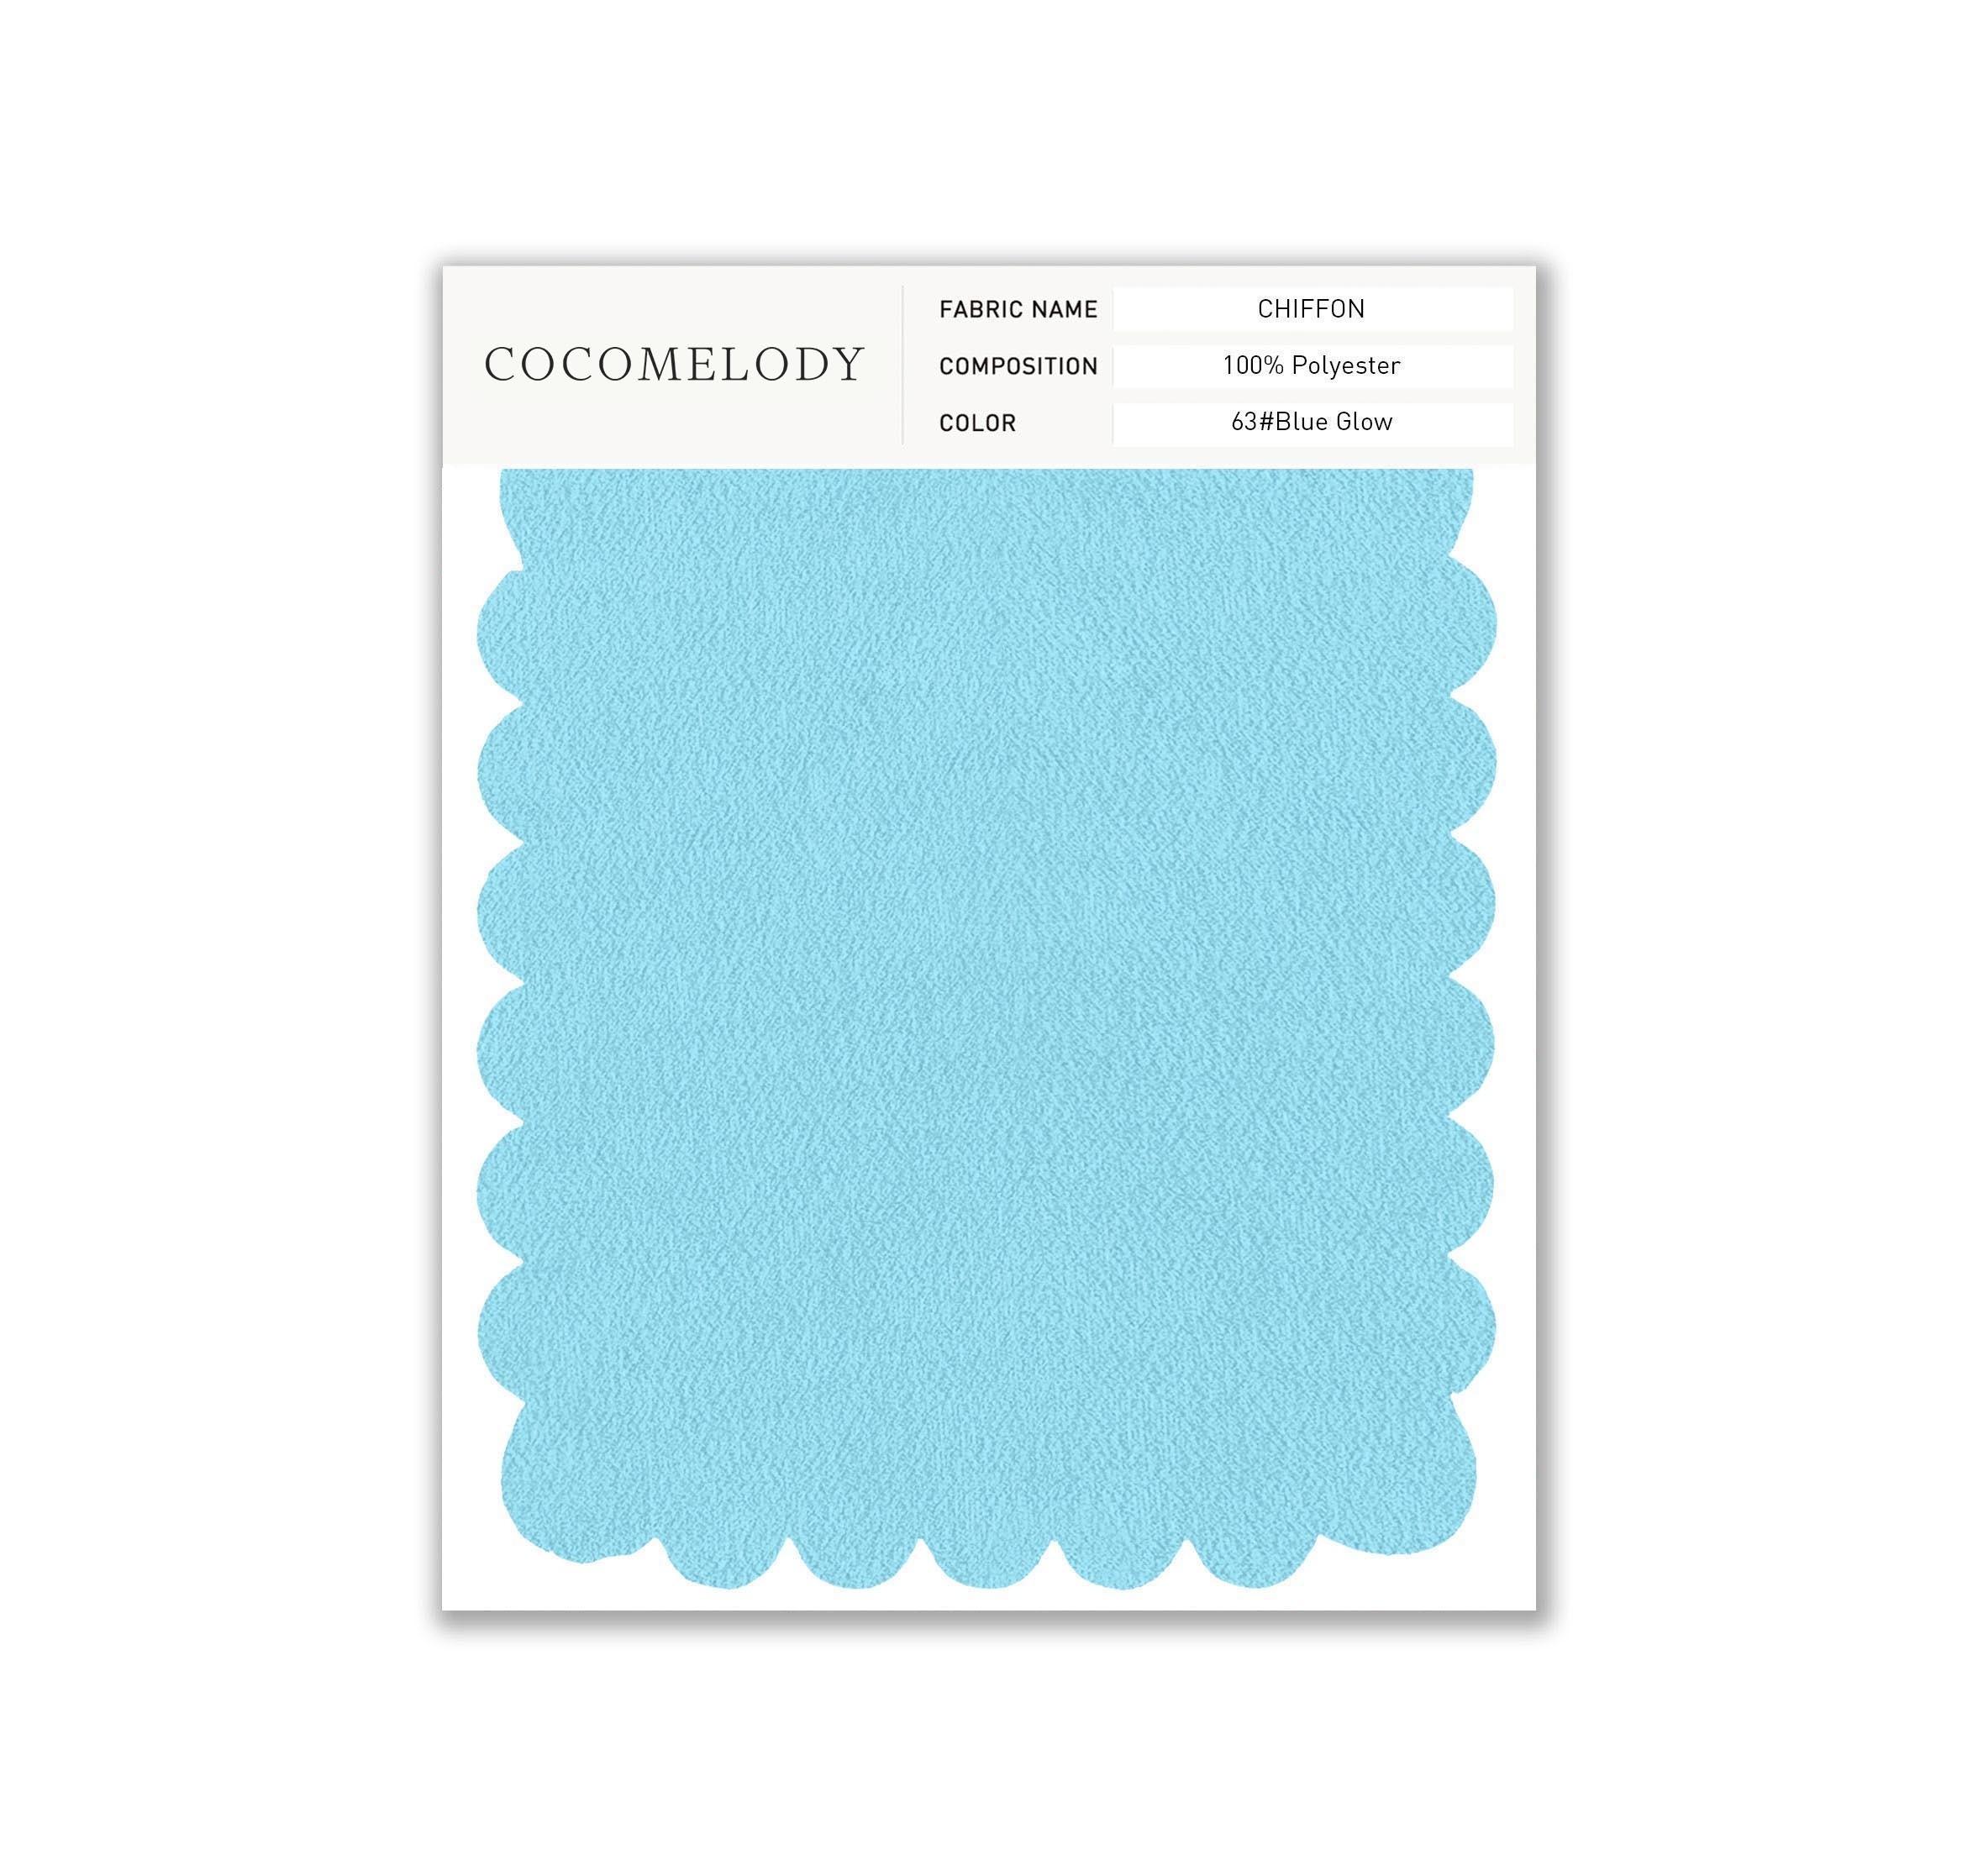 Chiffon Fabric Swatch in Single Color SWCH16001